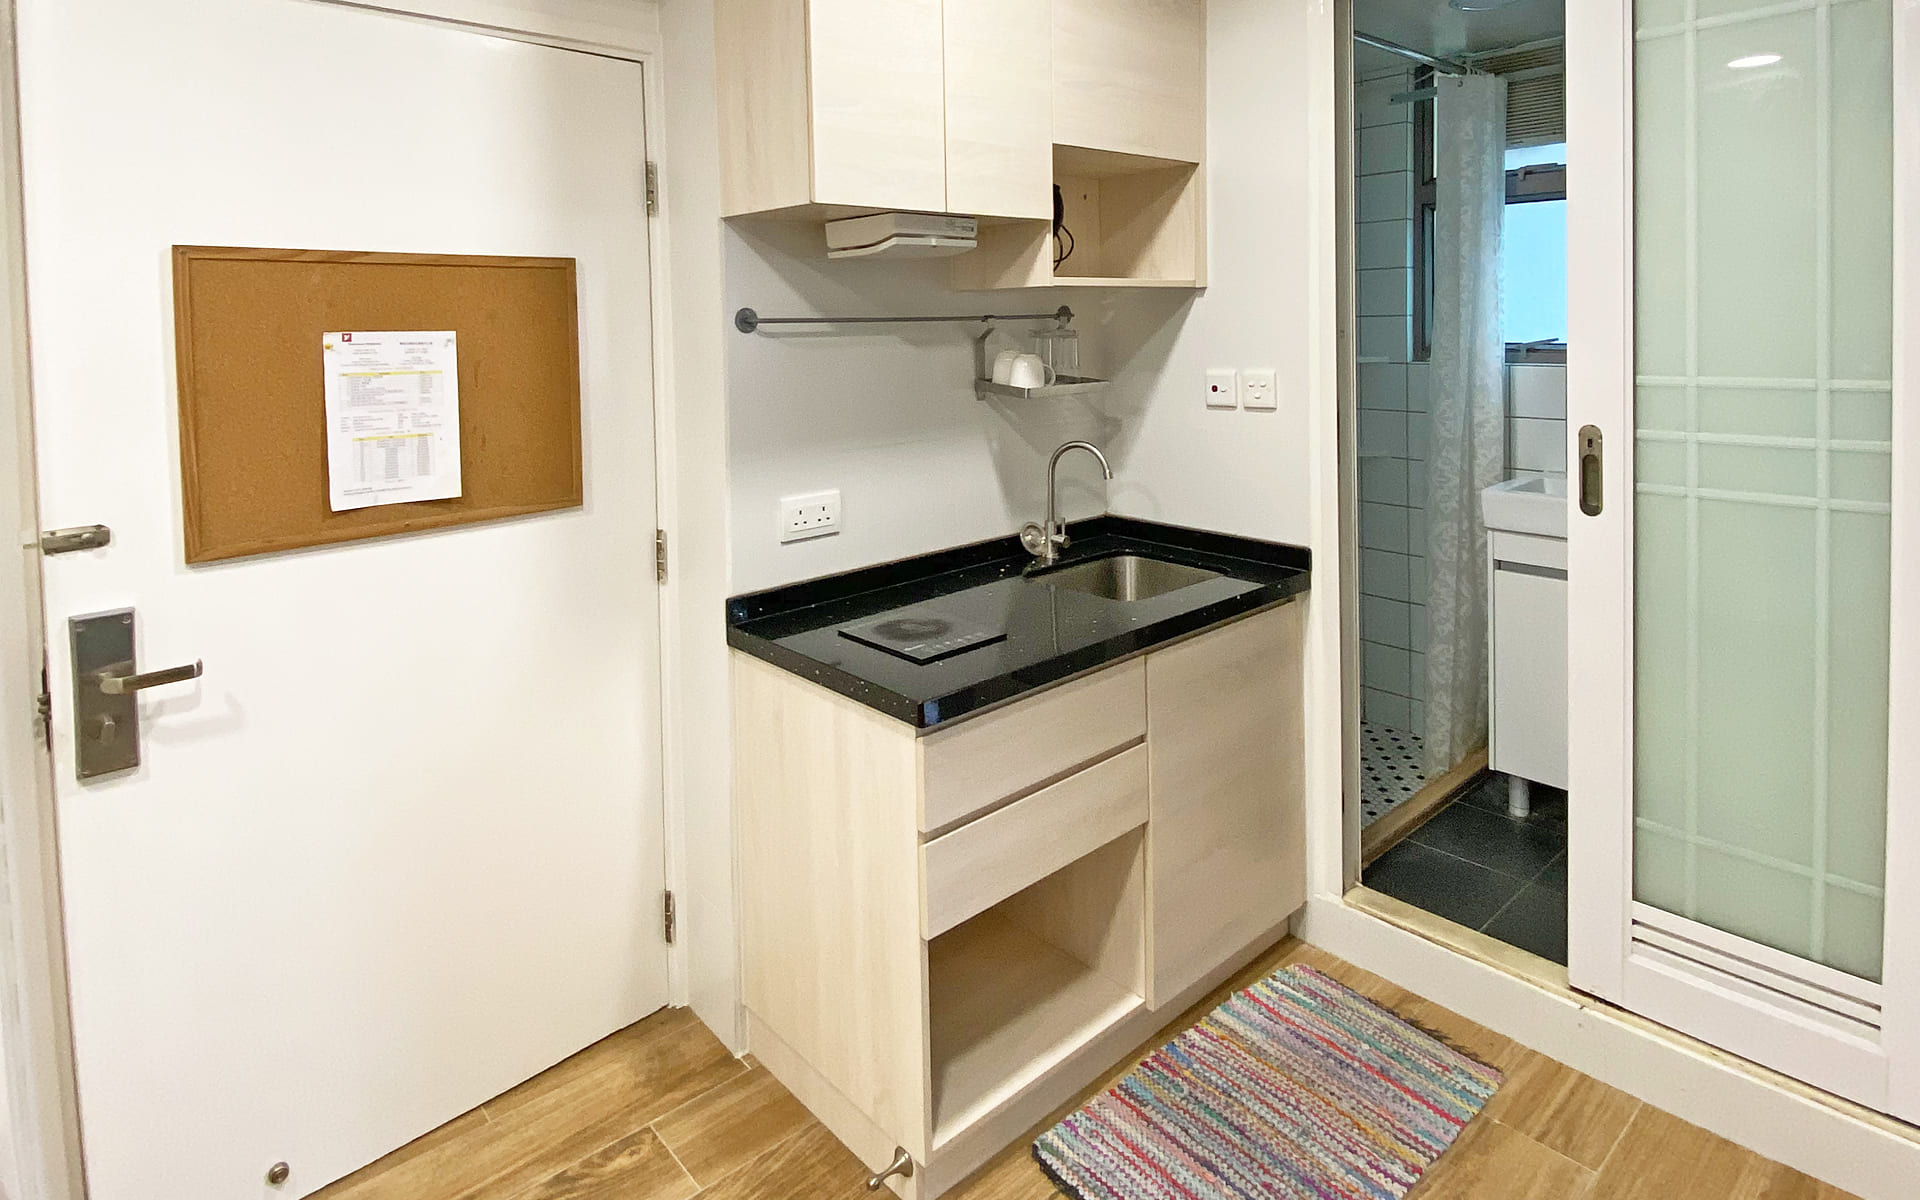 hk_service_apartment_11687540851593399938.jpg